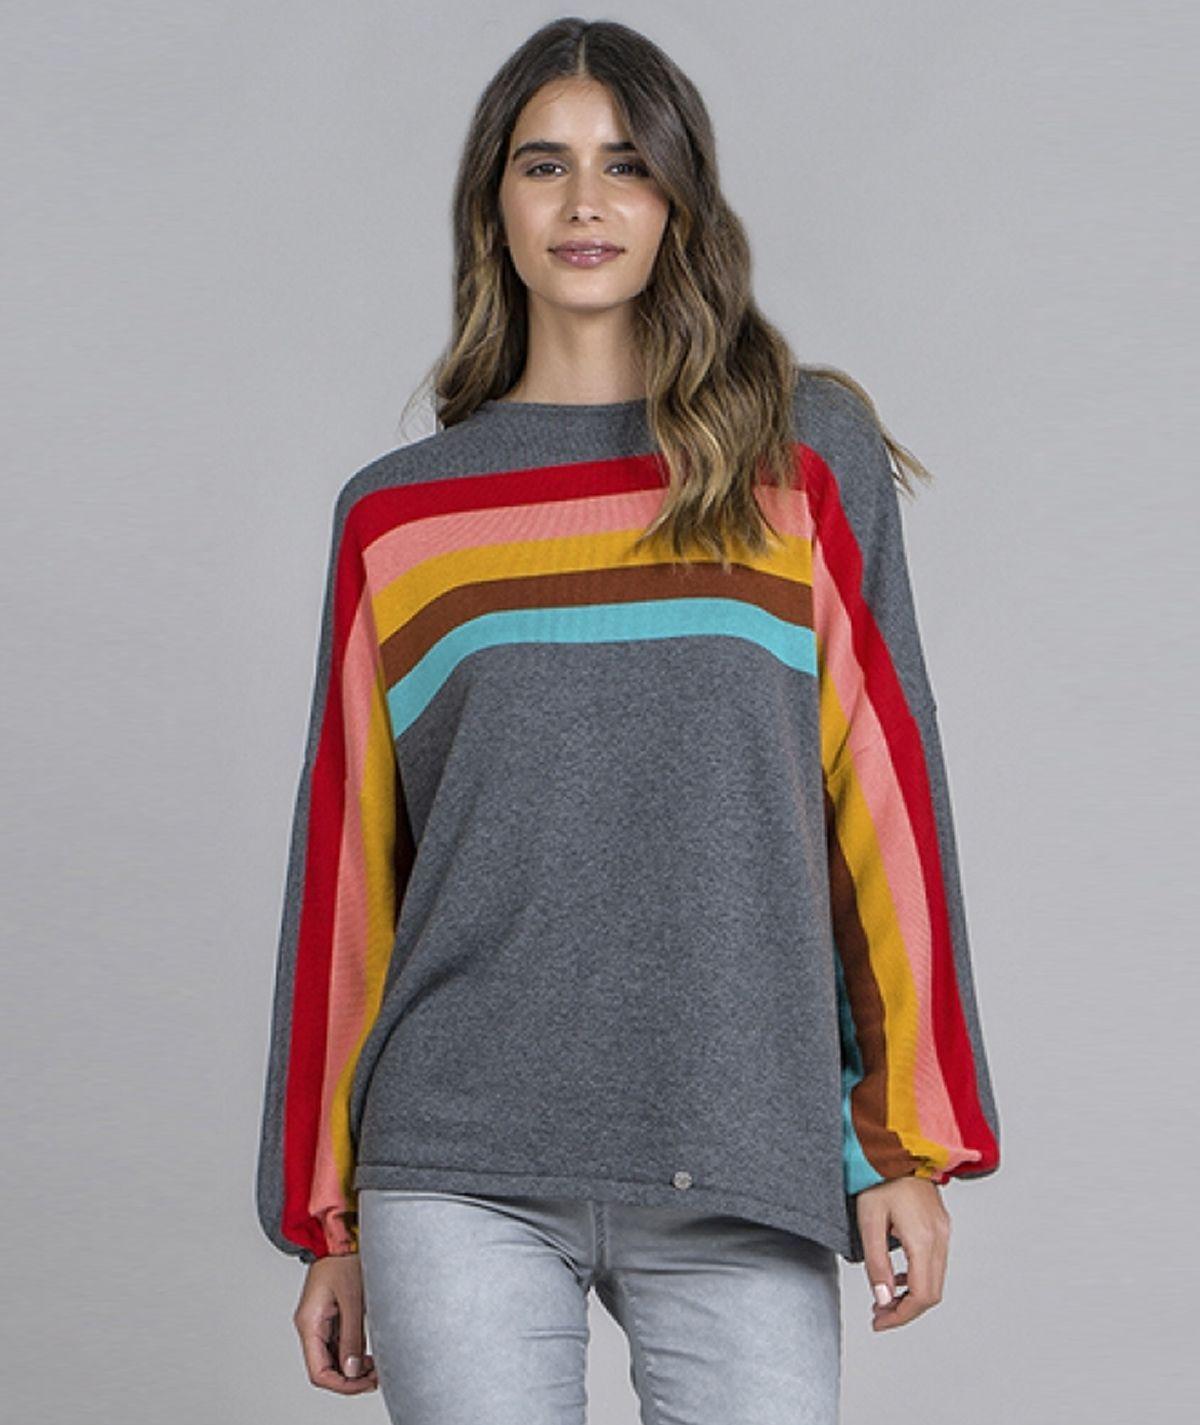 Camisola arco-íris